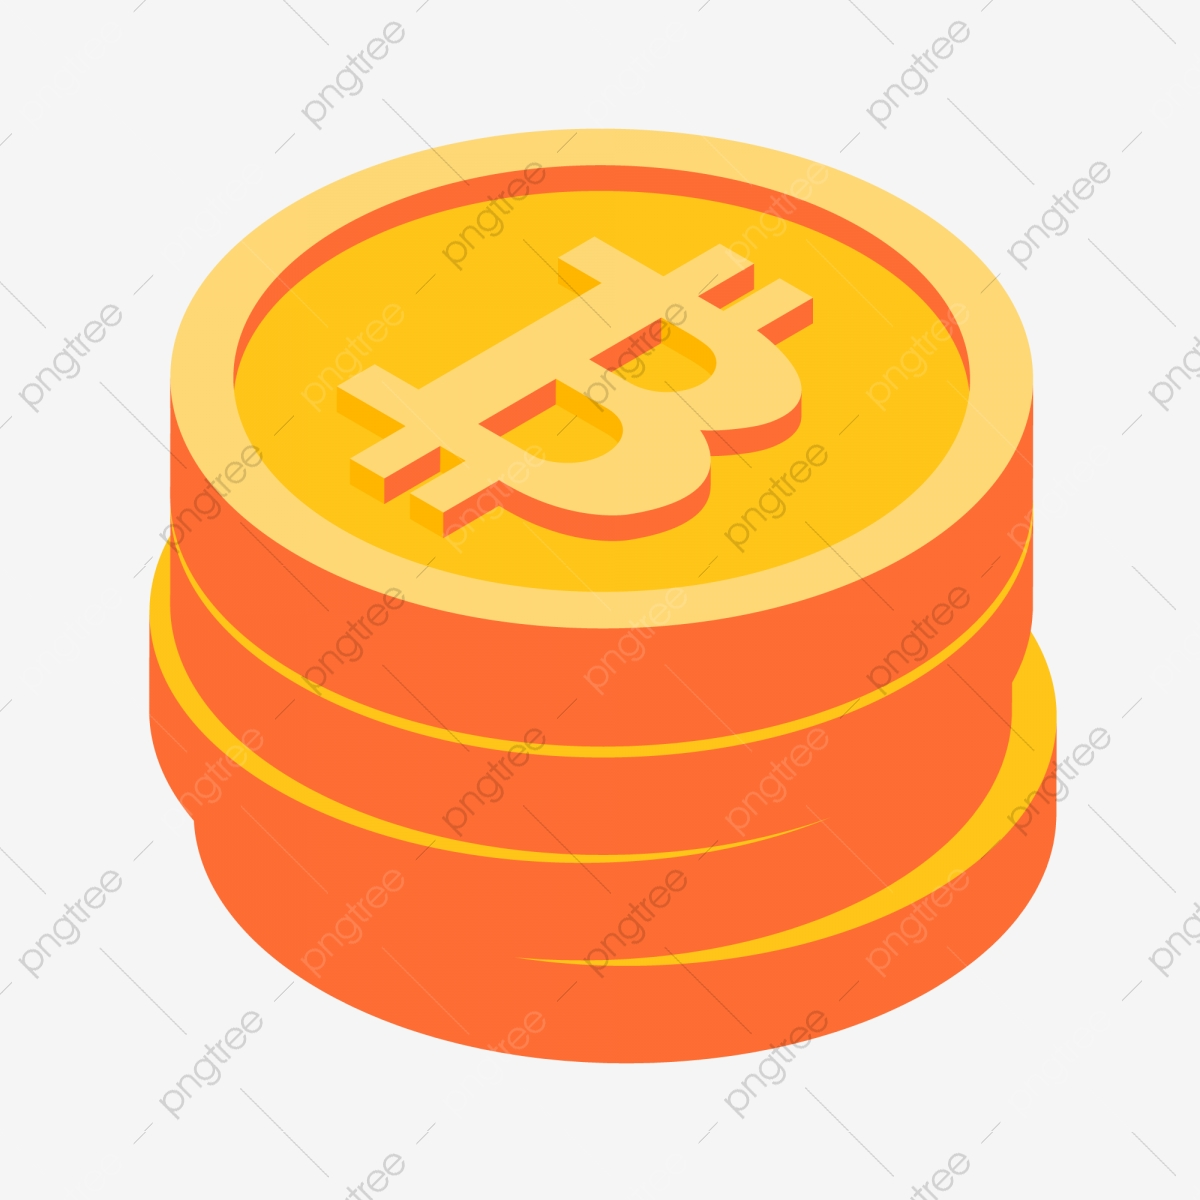 Cryptocurrency Course: Bitcoin, Litecoin, Eth, Ripple, Dash, Blockchain